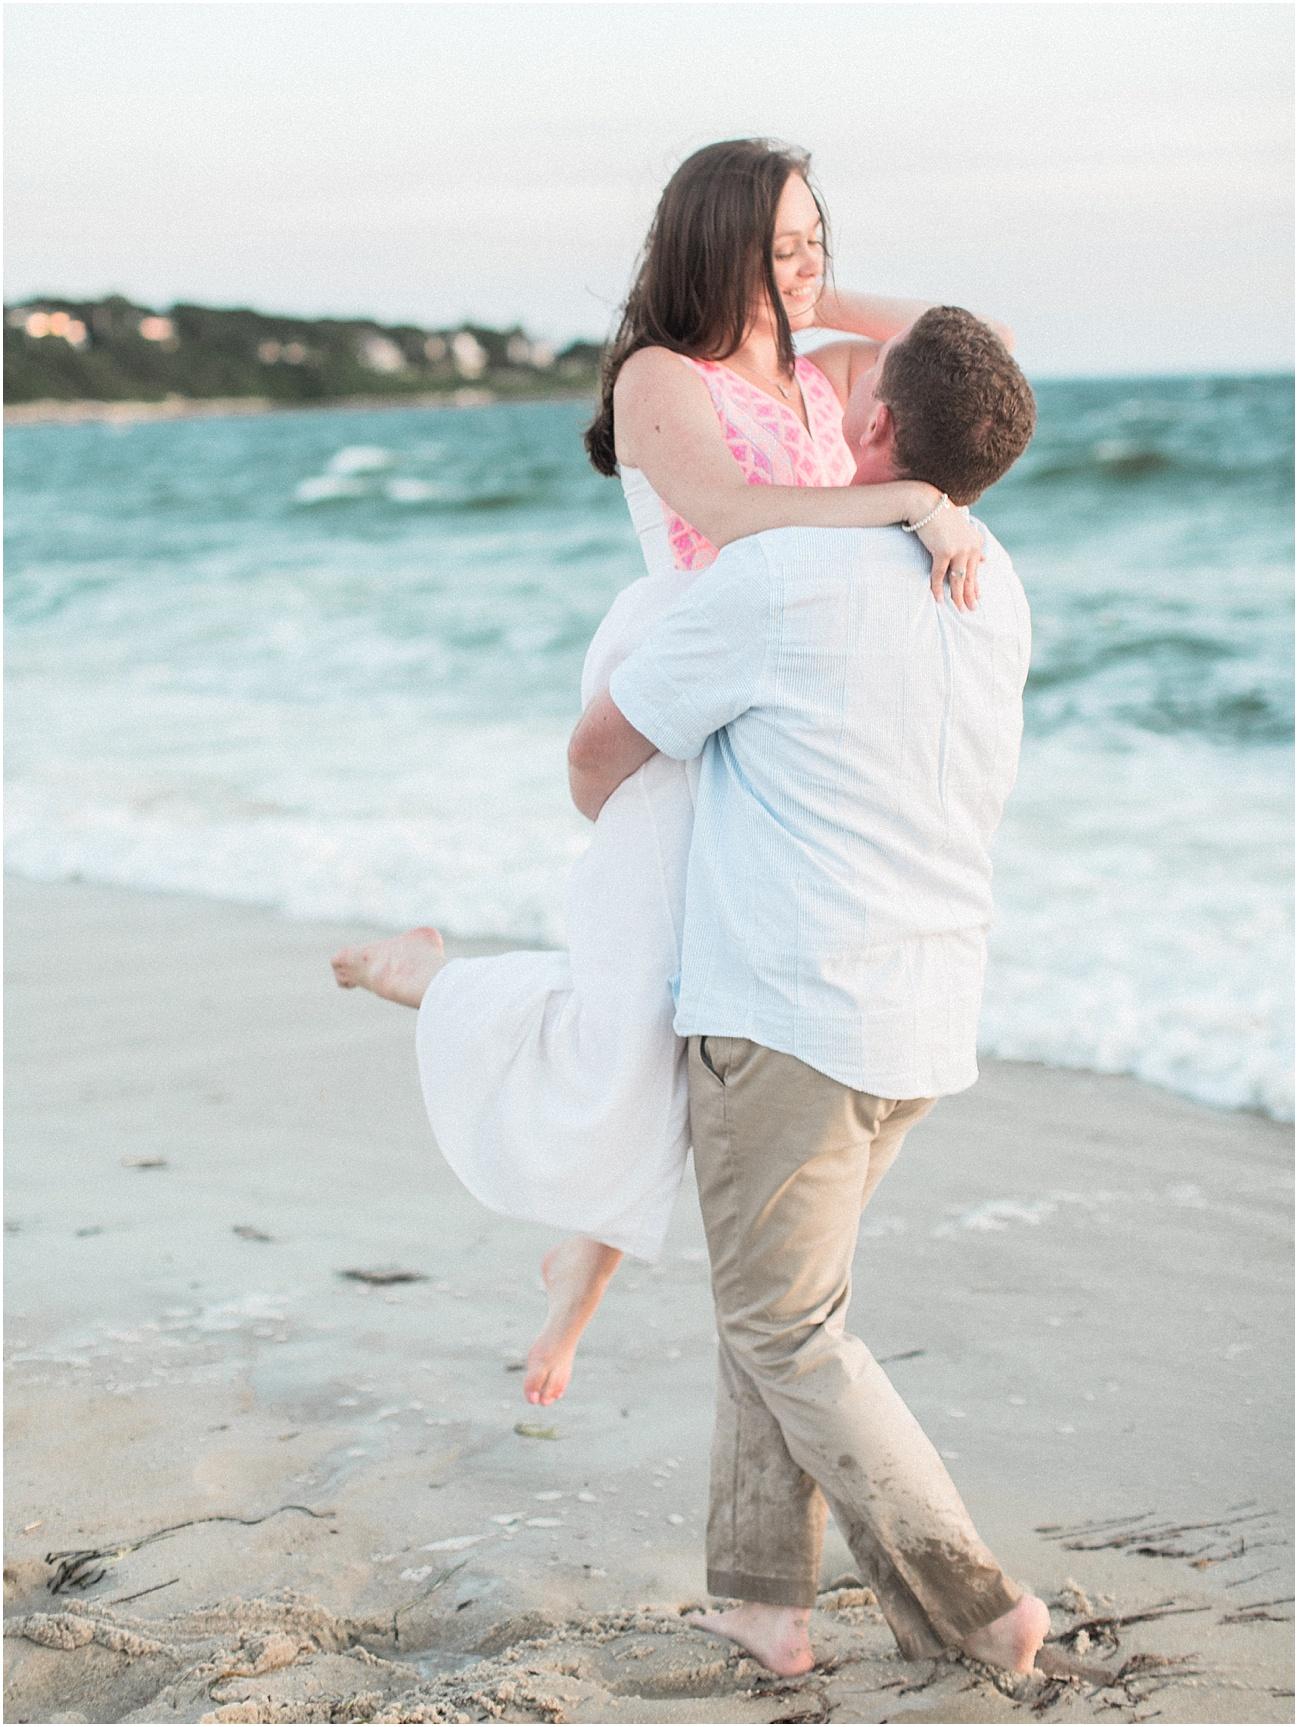 shannon_dan_engagement_session_sea_crest_beach_old_silver_chartroom_yacht_club_cape_cod_boston_wedding_photographer_meredith_jane_photography_photo_0340.jpg